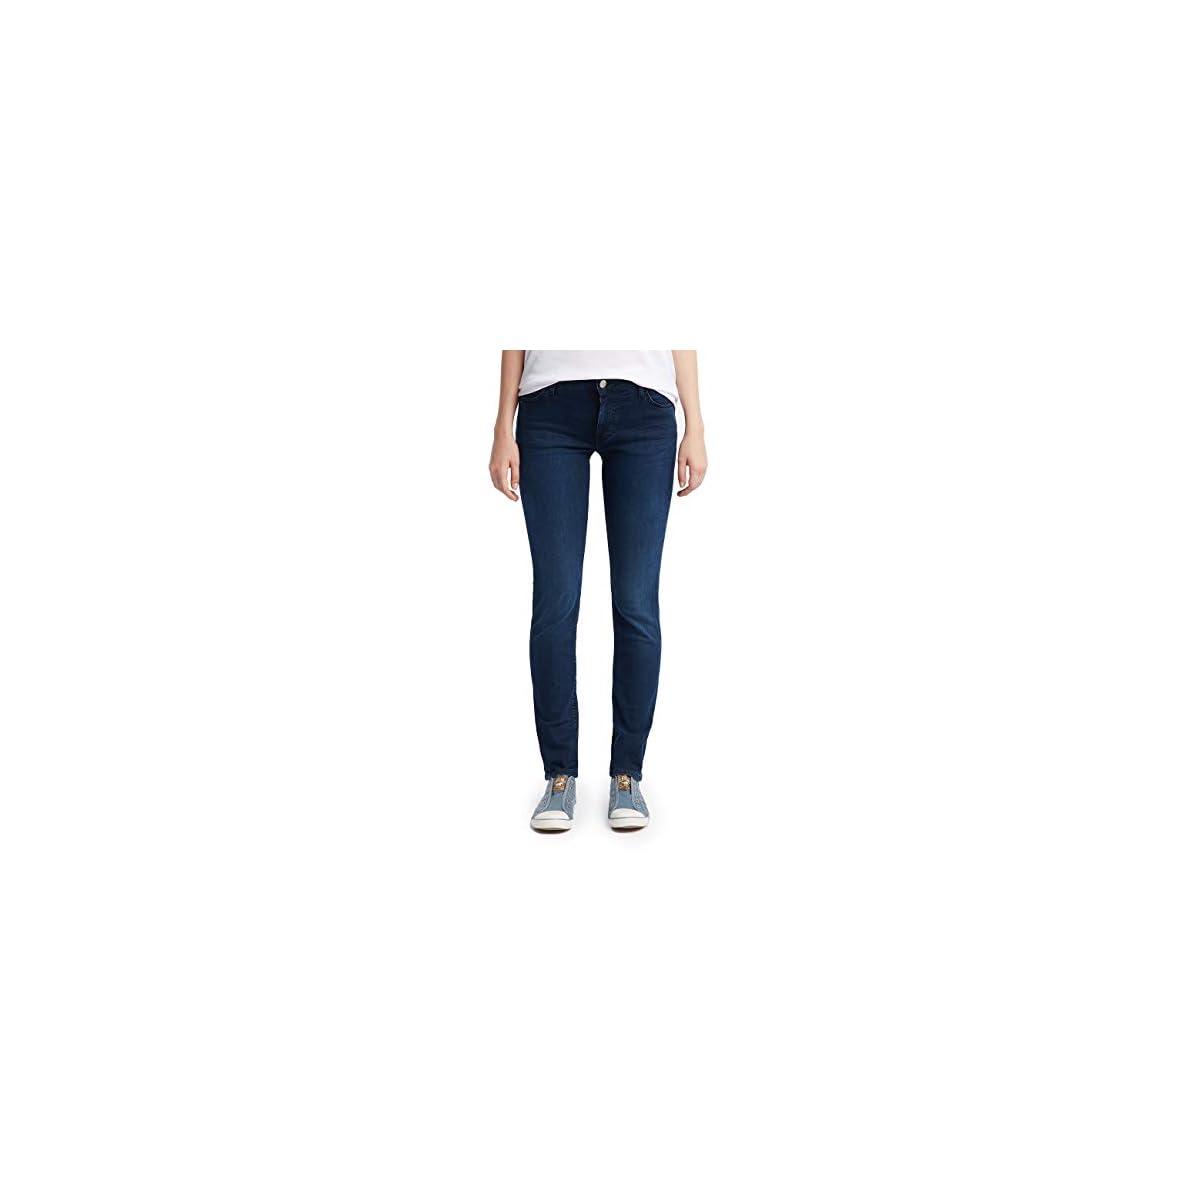 MUSTANG Damen SoftPerfect Fit Sissy Slim Jeans